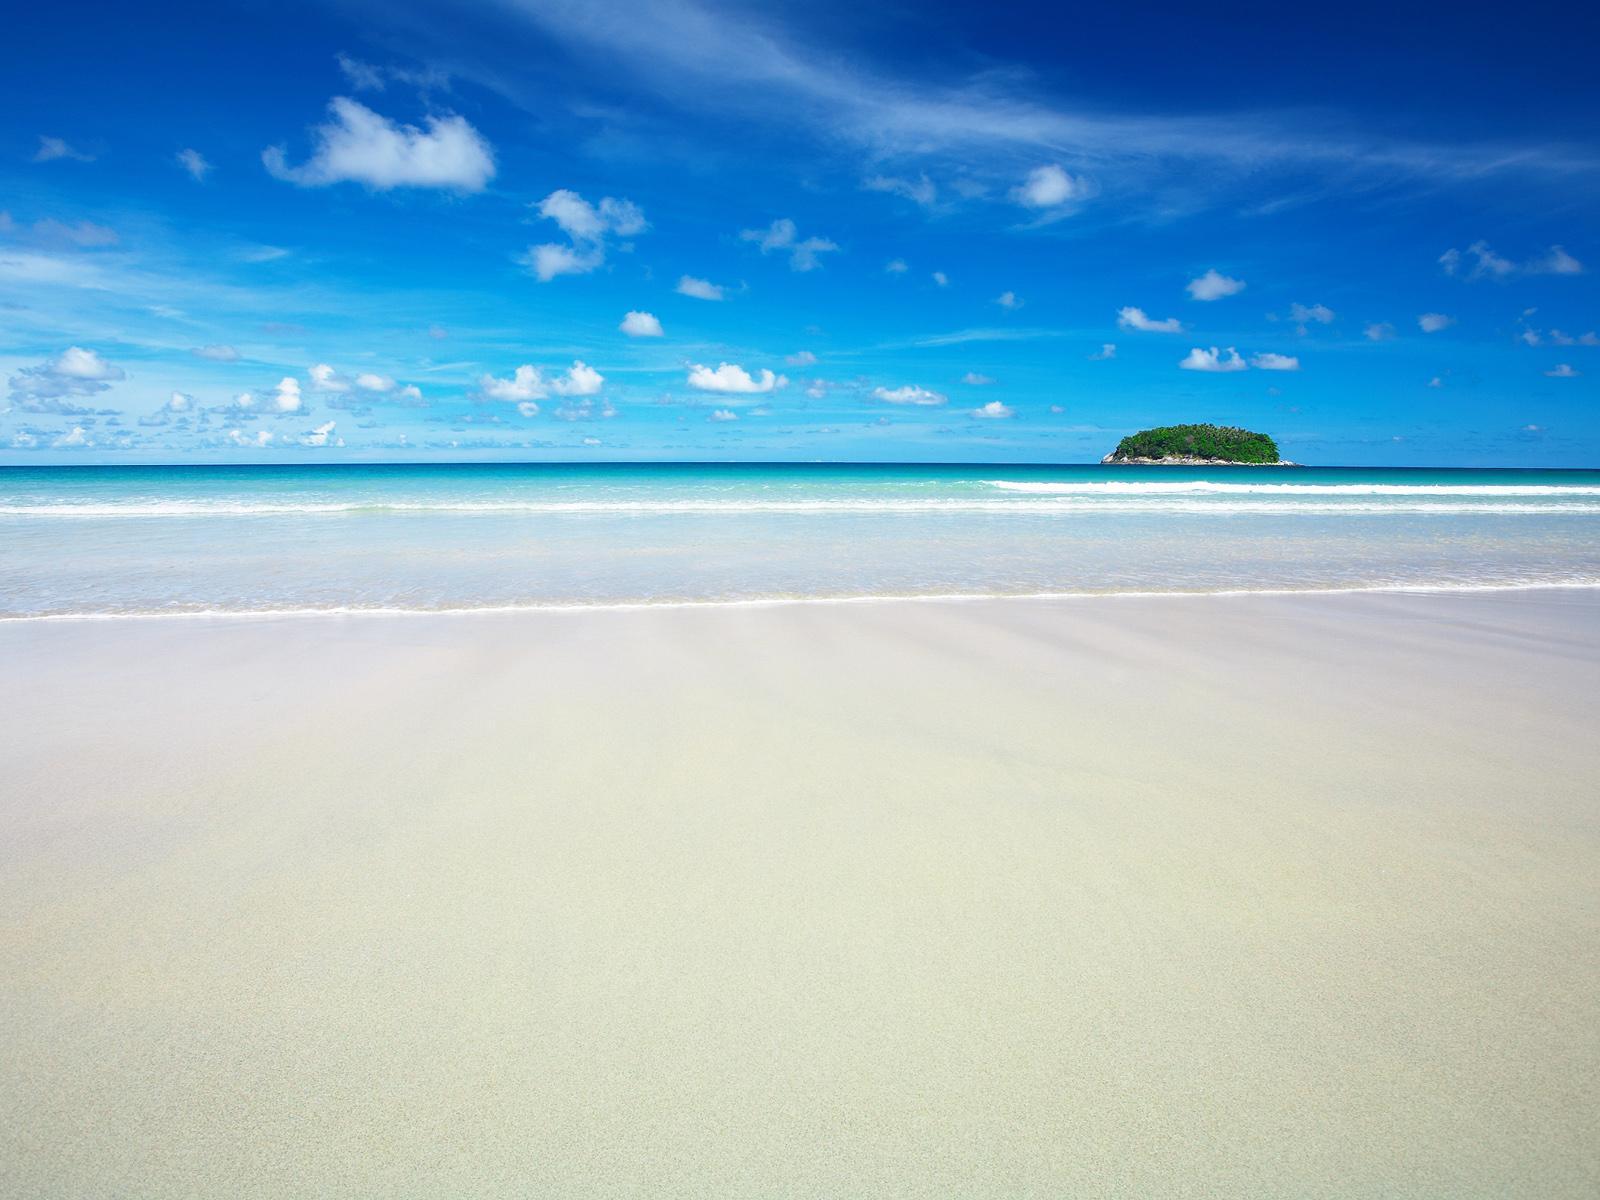 http://4.bp.blogspot.com/-Ar7L_nCVR1I/TszjiUYKv1I/AAAAAAAAAmg/qKlbMk4tVgM/s1600/Paradise-Premium-Widescreen-Wallpaper.jpg